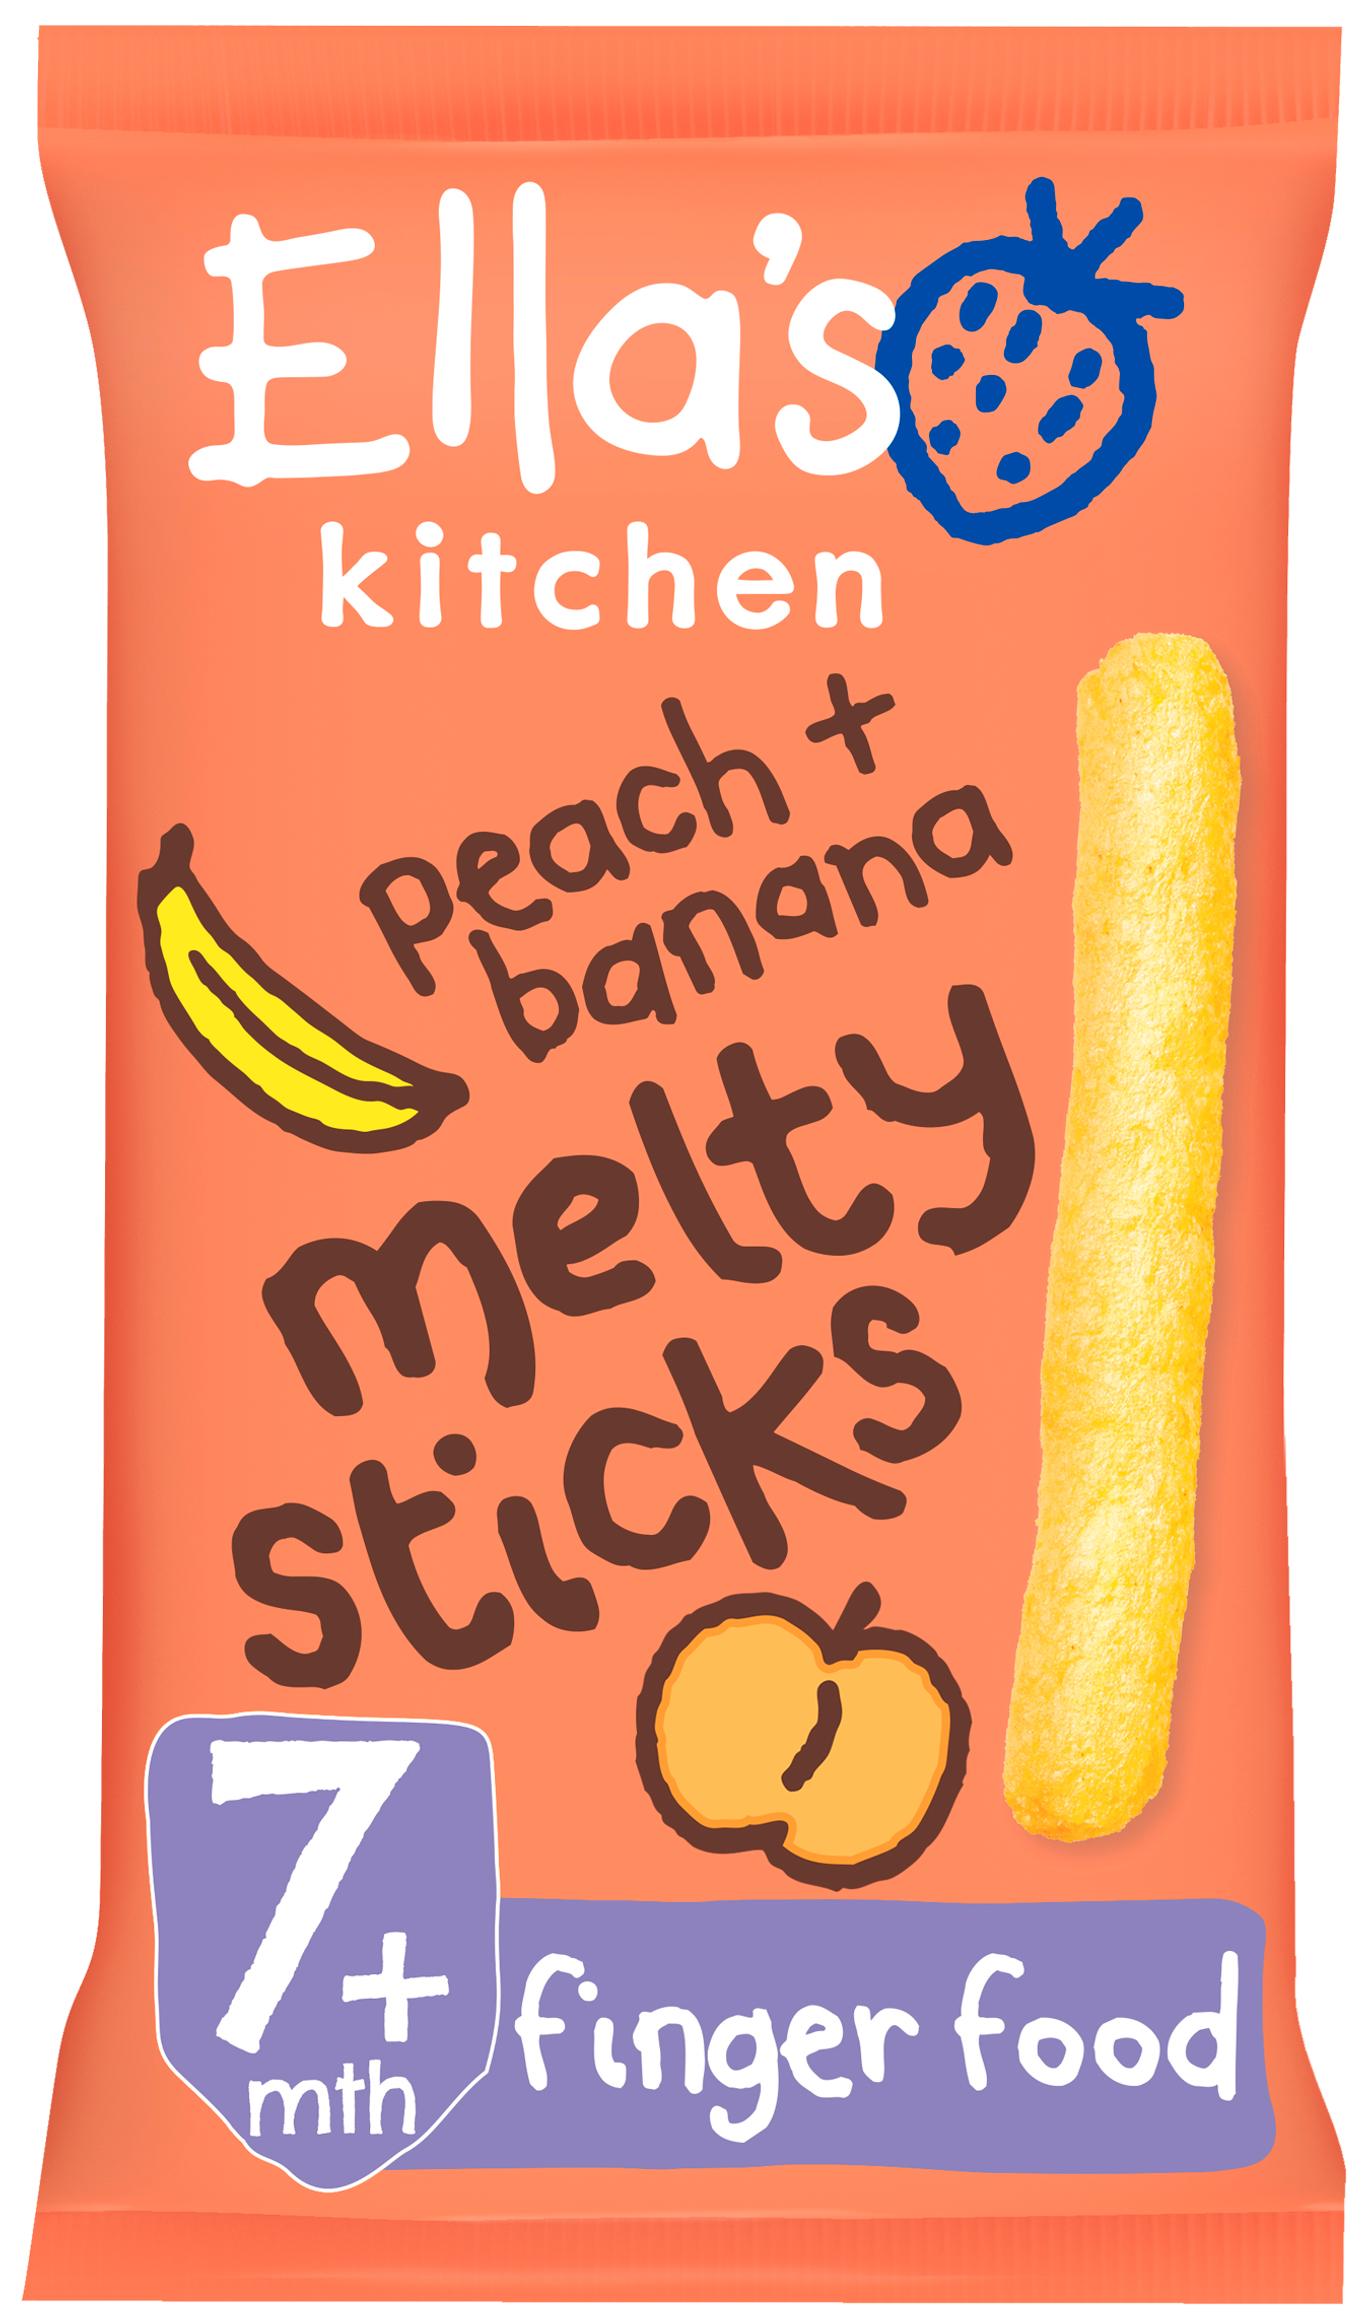 Ellas kitchen melty sticks peach banana bag front of pack O